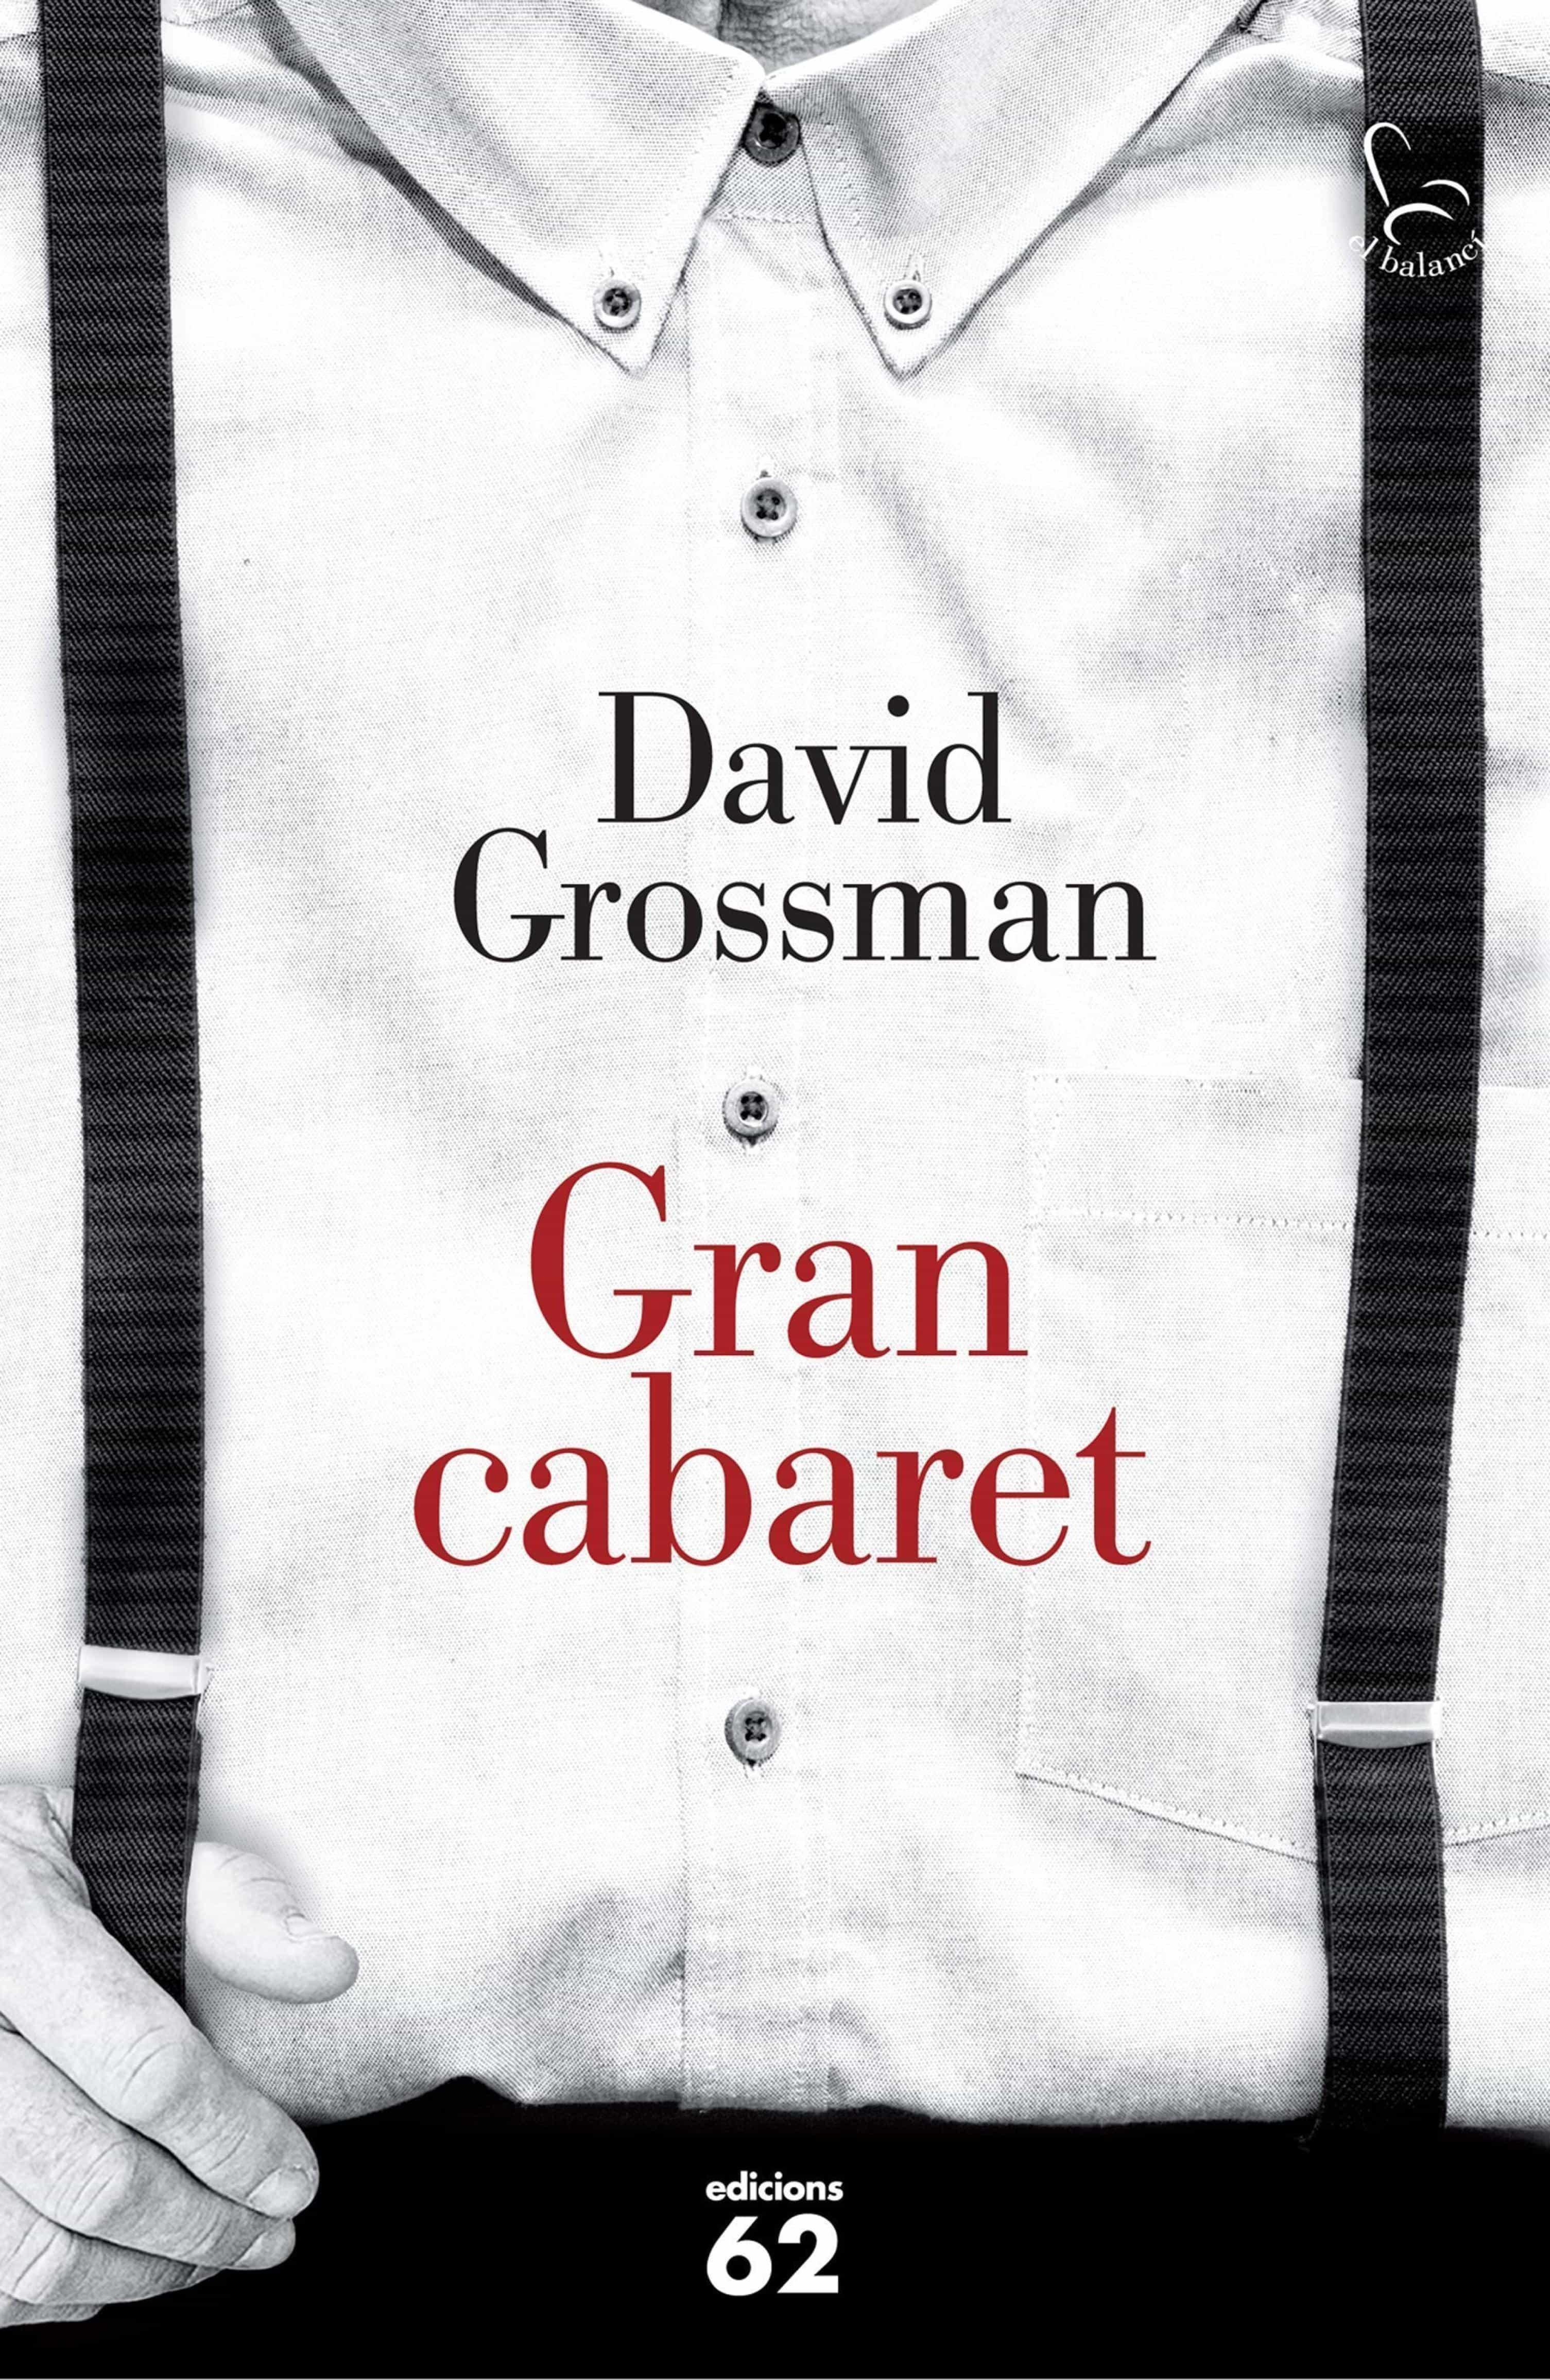 David Grossman Epub